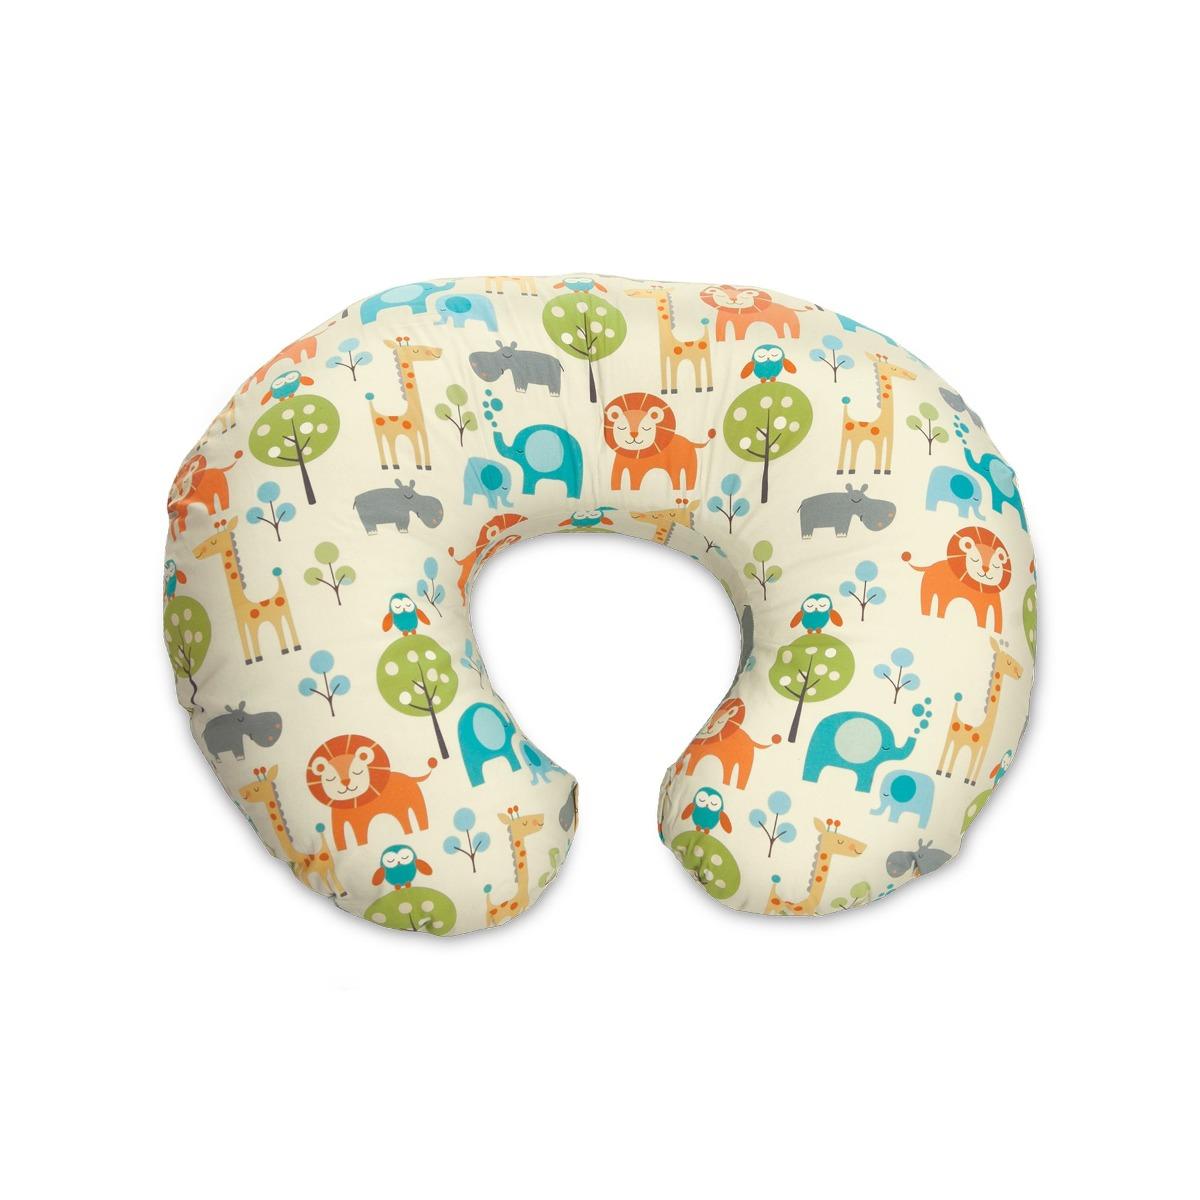 Picture of: Boppy Nursing Pillow And Positioner Peaceful Jungle 260 900 En Mercado Libre